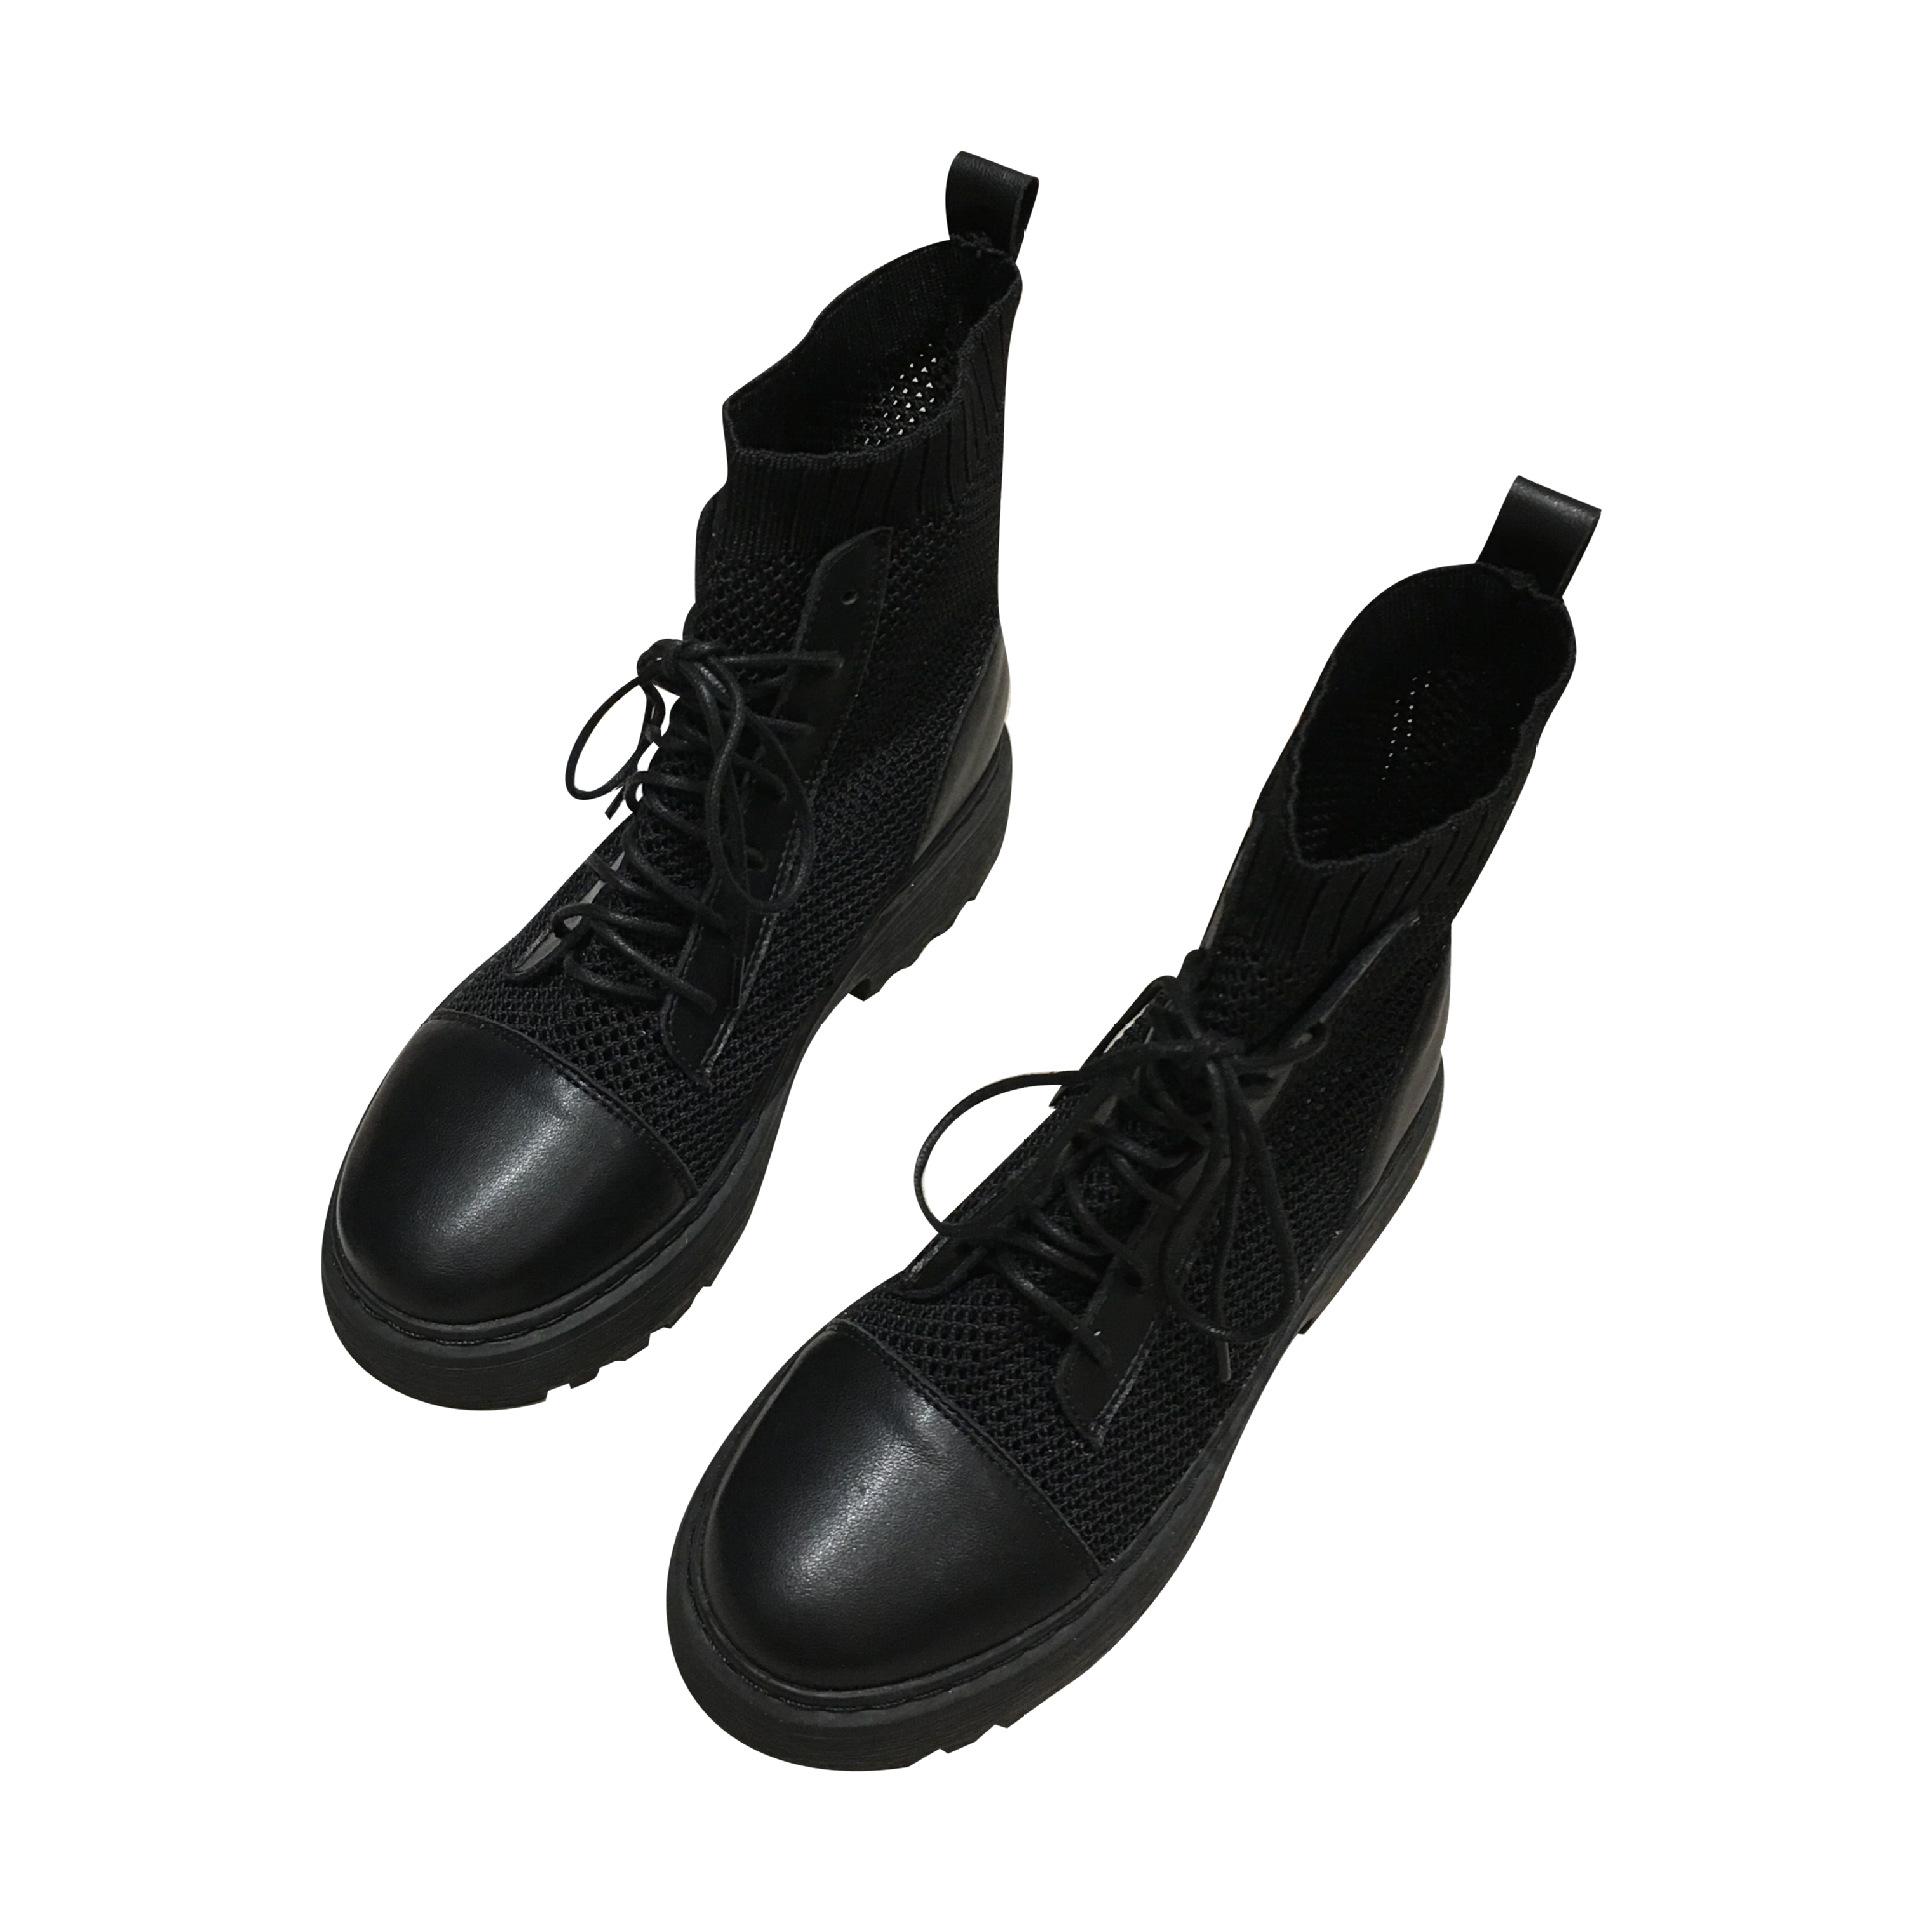 MSCS545短靴夏天百搭马丁靴女夏季薄款透气真皮网纱镂空靴女靴子